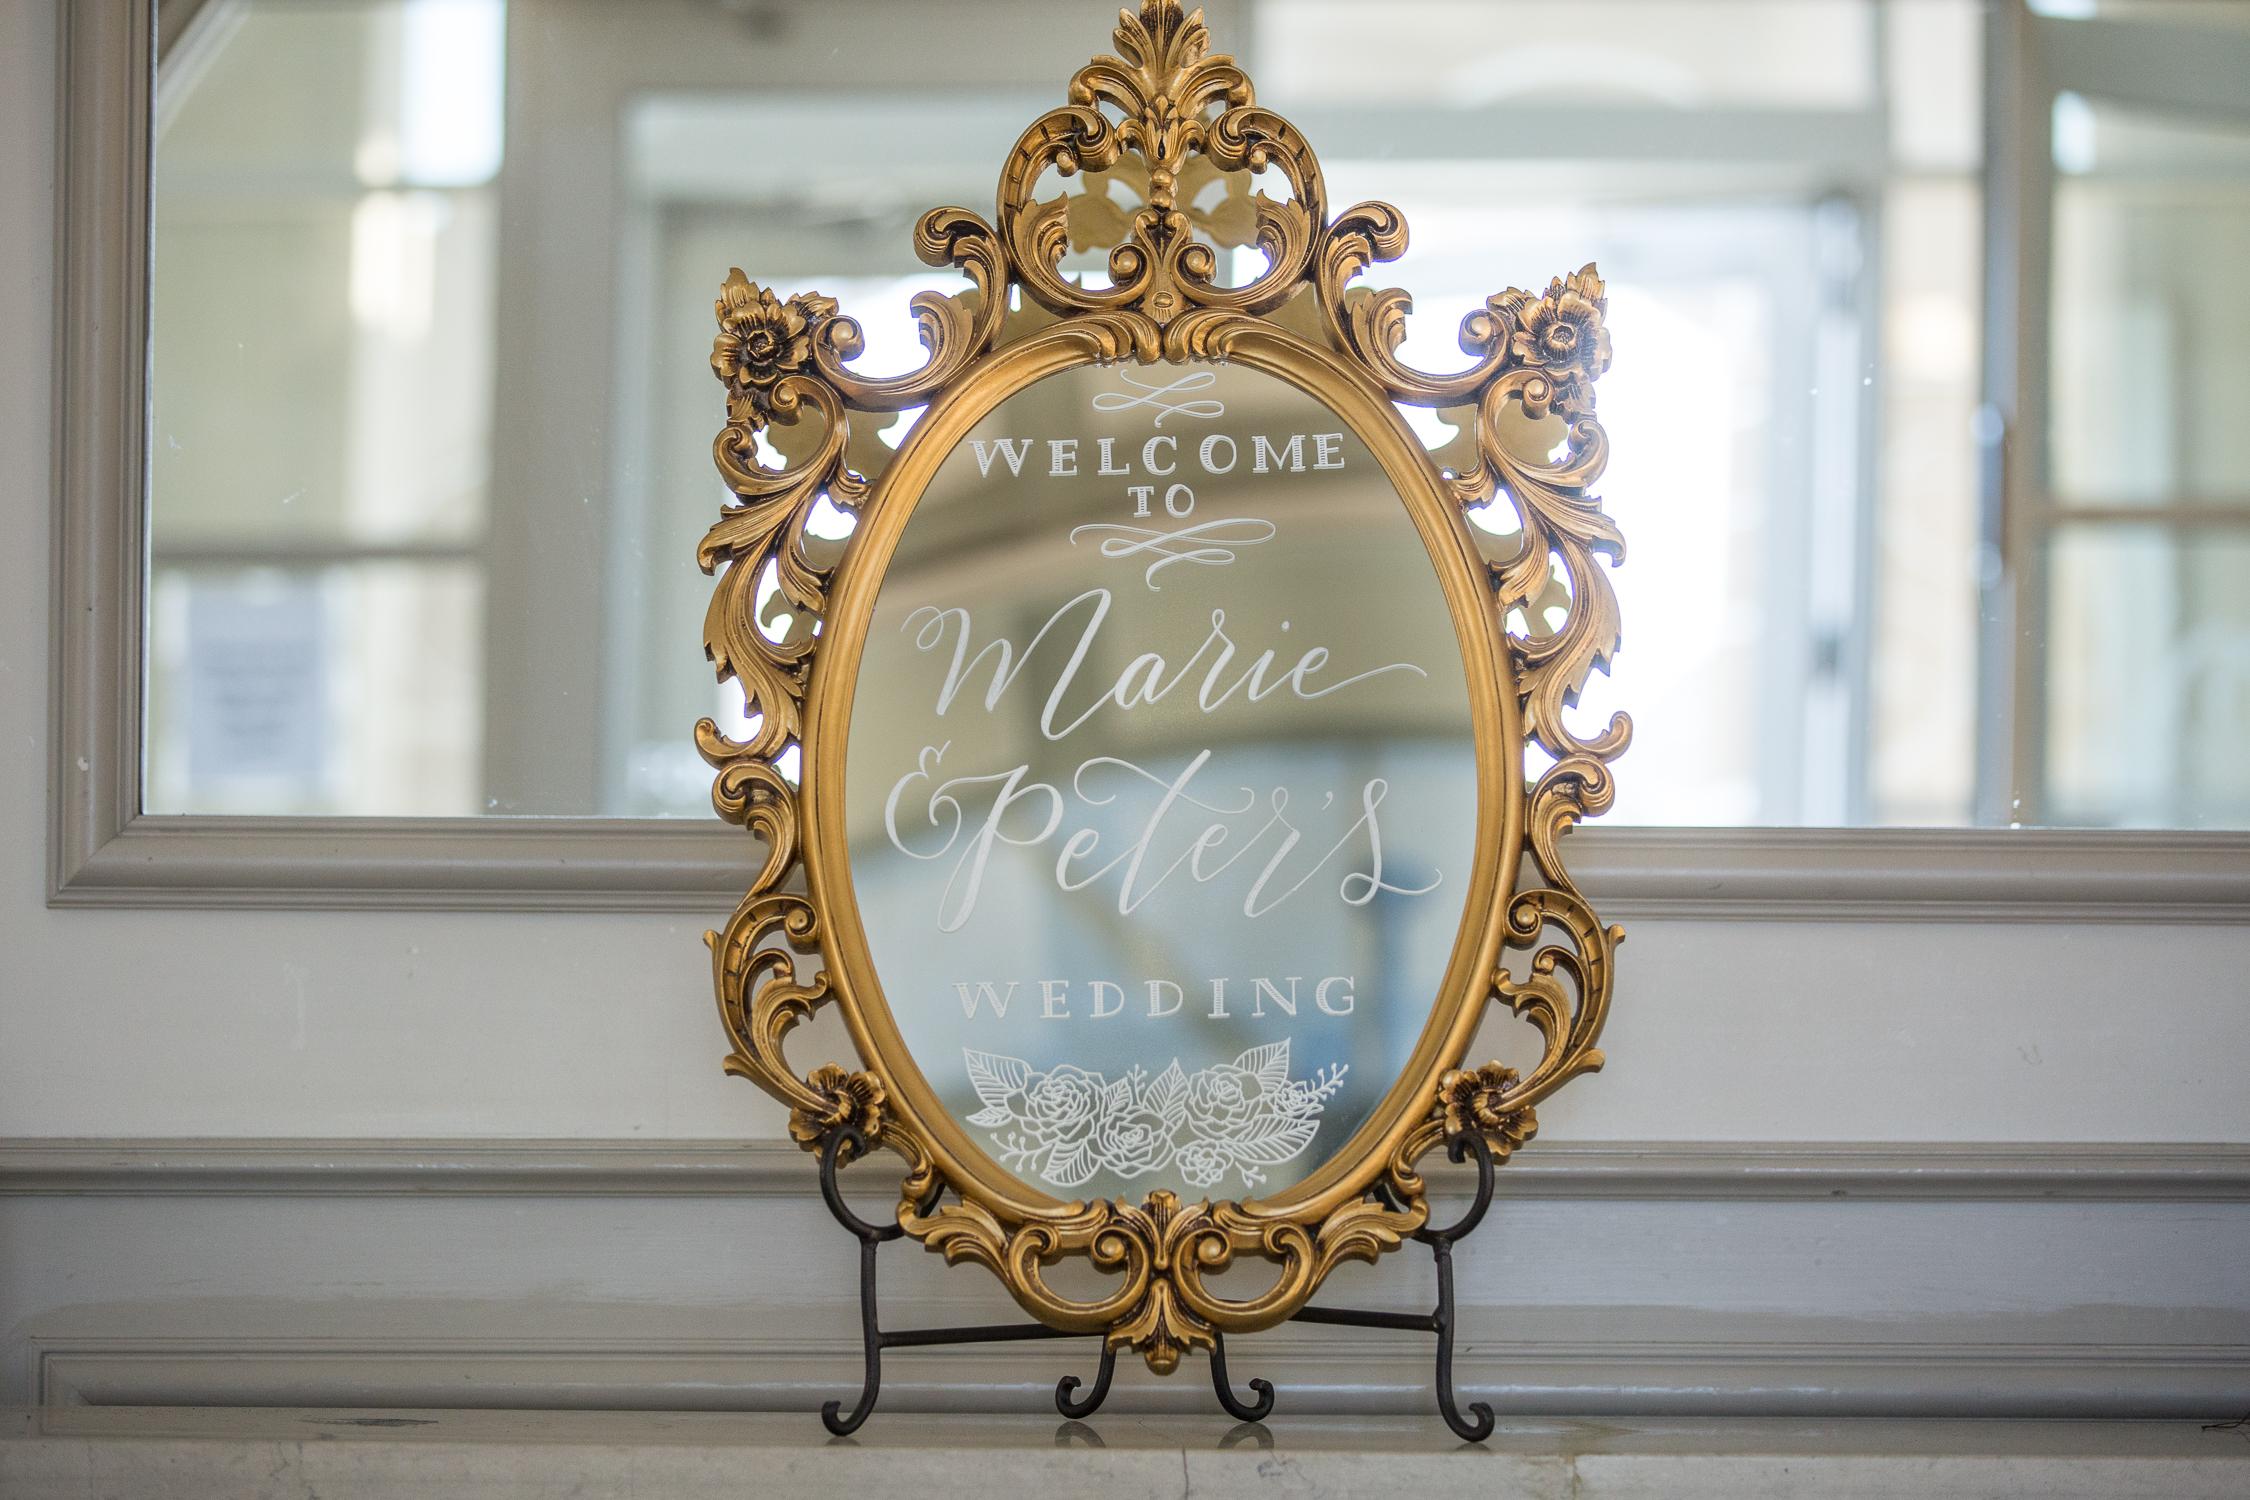 Peter-and-Marie-Wedding-Fontana-Primavera-Graydon-Hall-Manor-Toronto-Ontario-Canada-0033.jpg